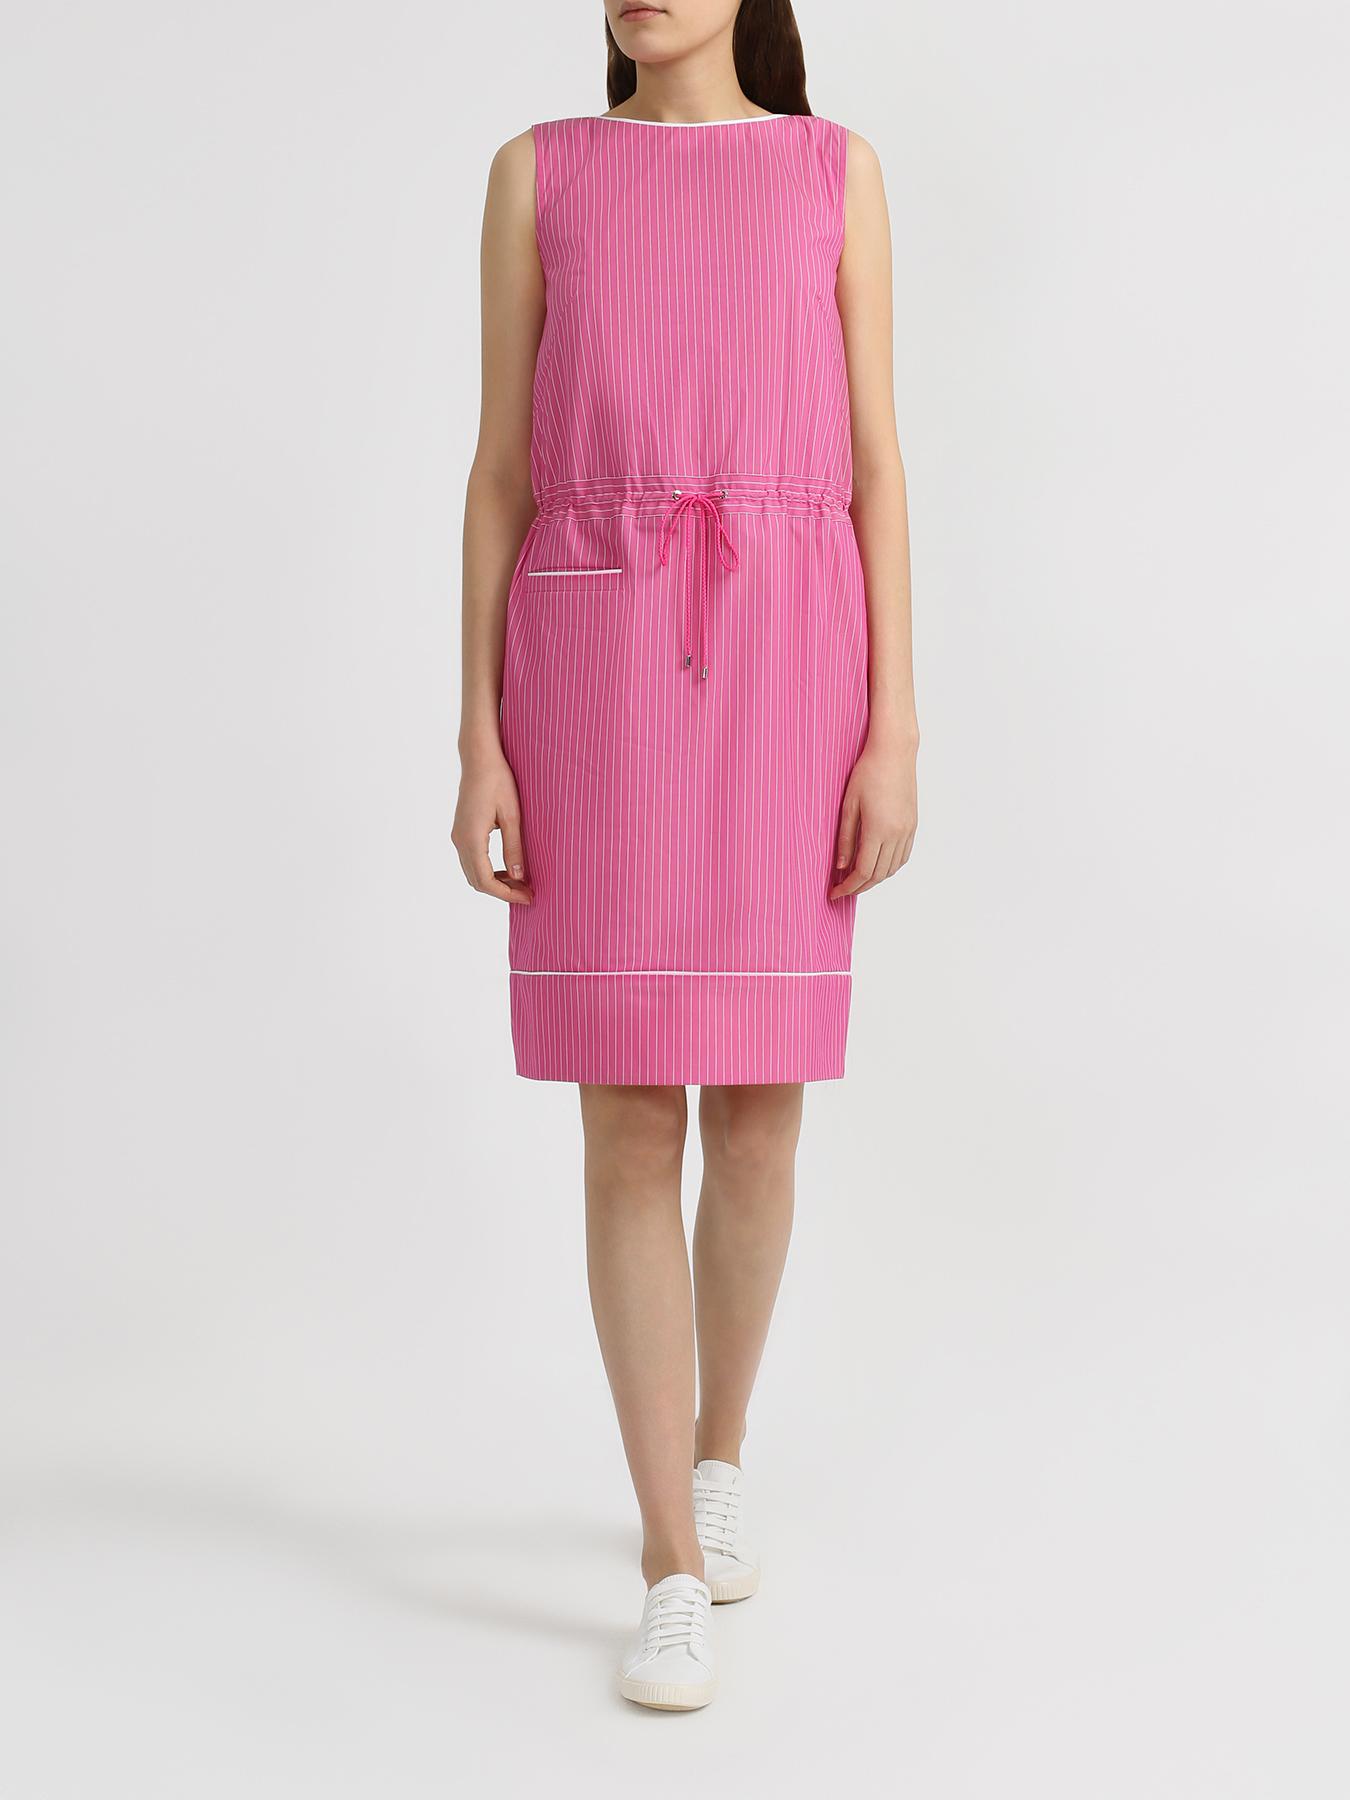 Finisterre Платье без рукавов фото